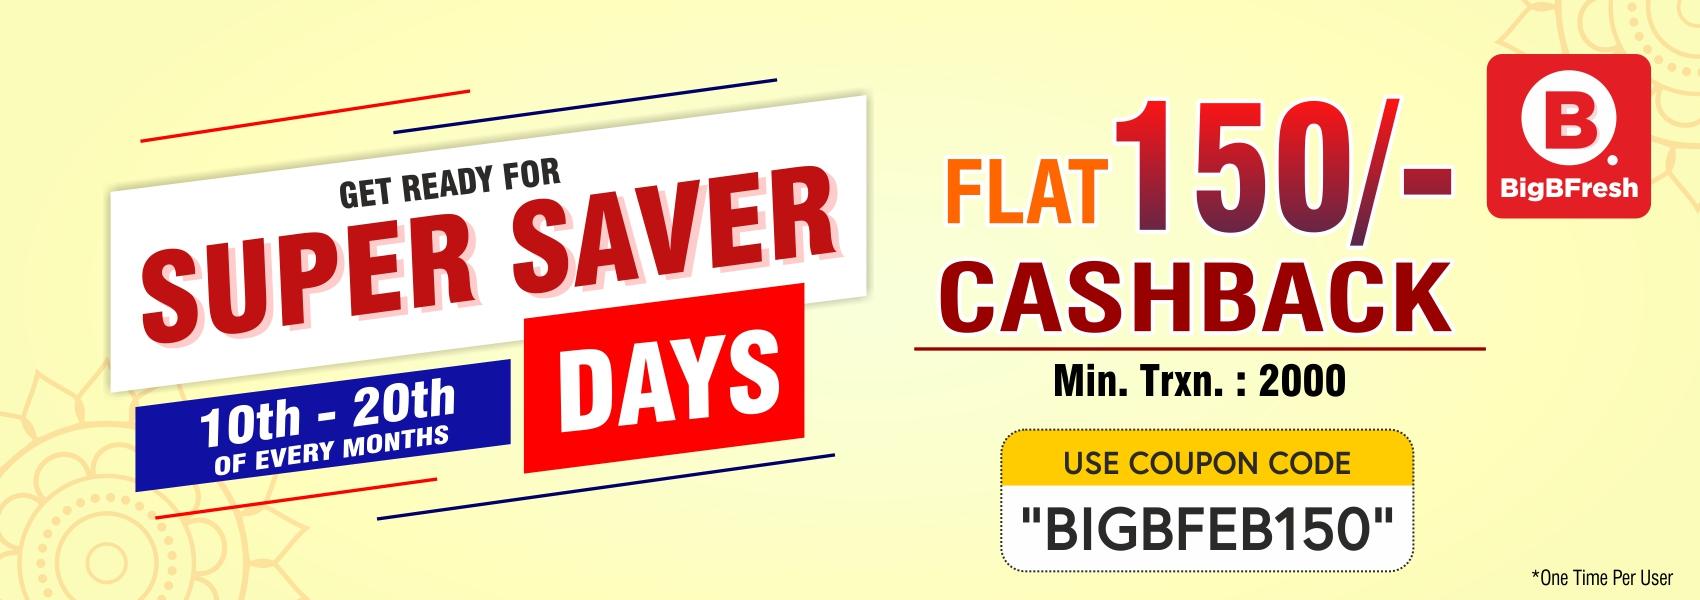 From Feb 10 to 20 - Flat 150 Cashback order above 2000 at BigBFreshStore.com